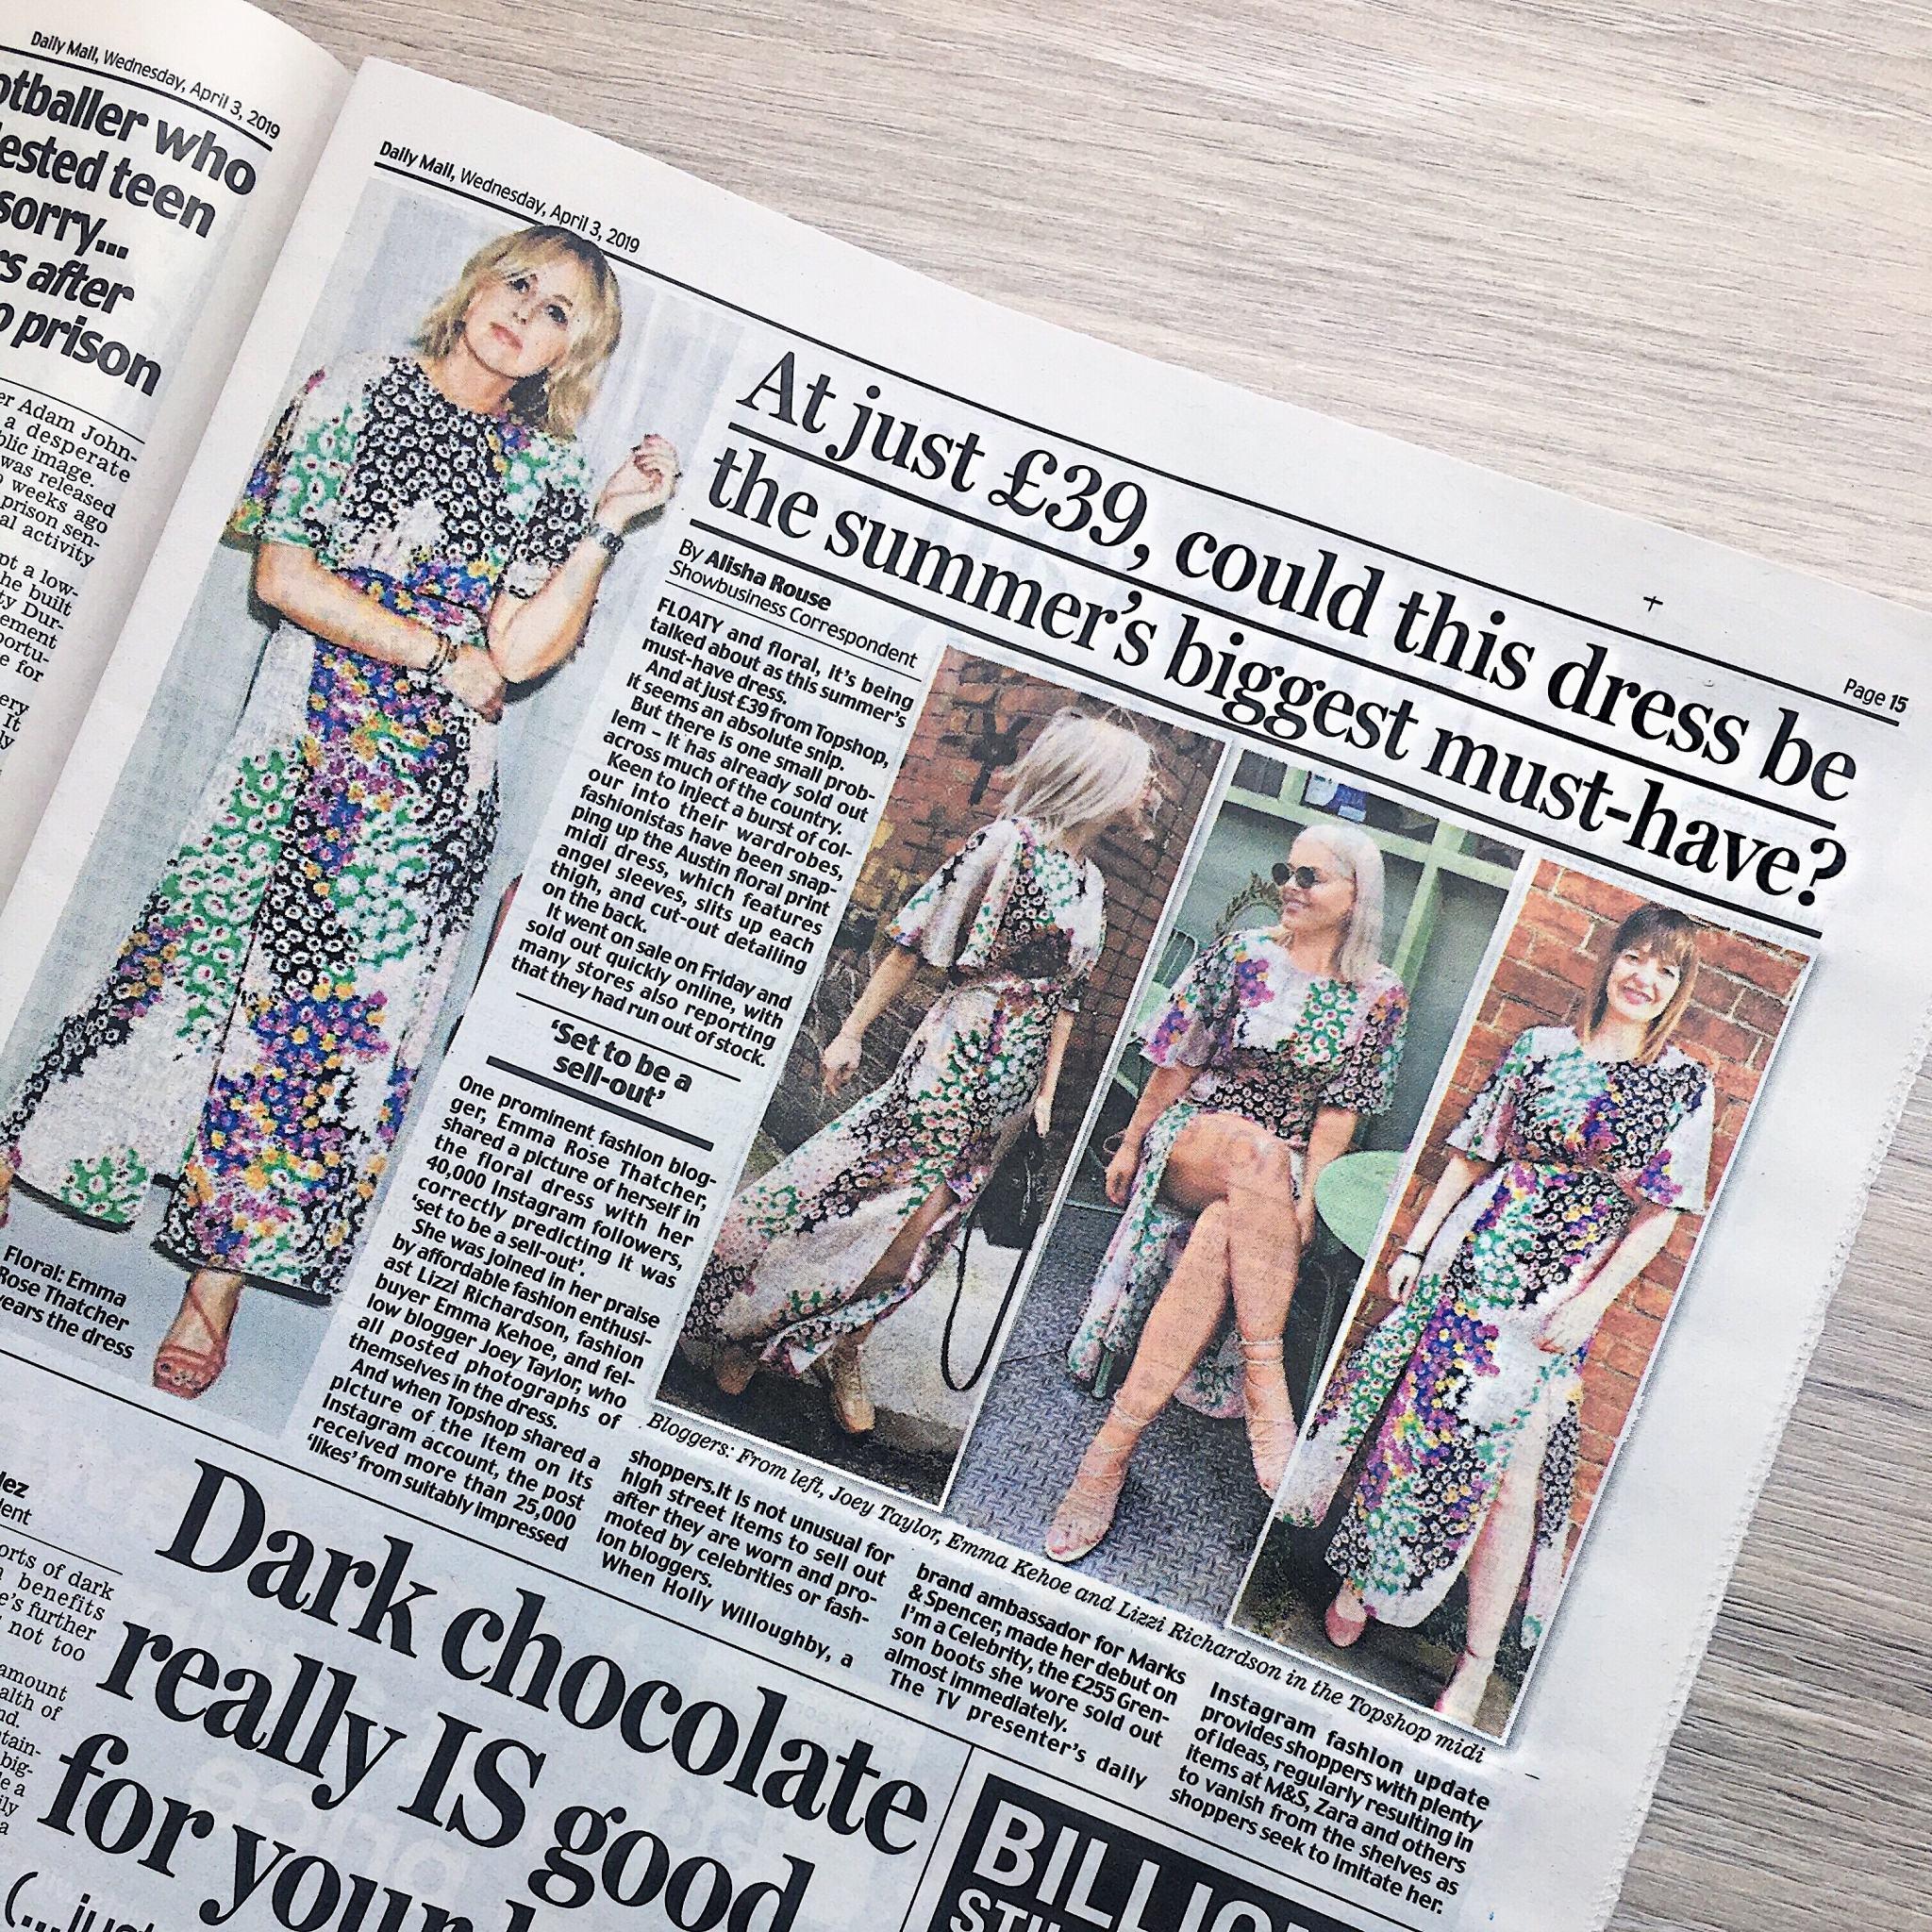 Daily Mail Austin Dress - Lizzi Richardson